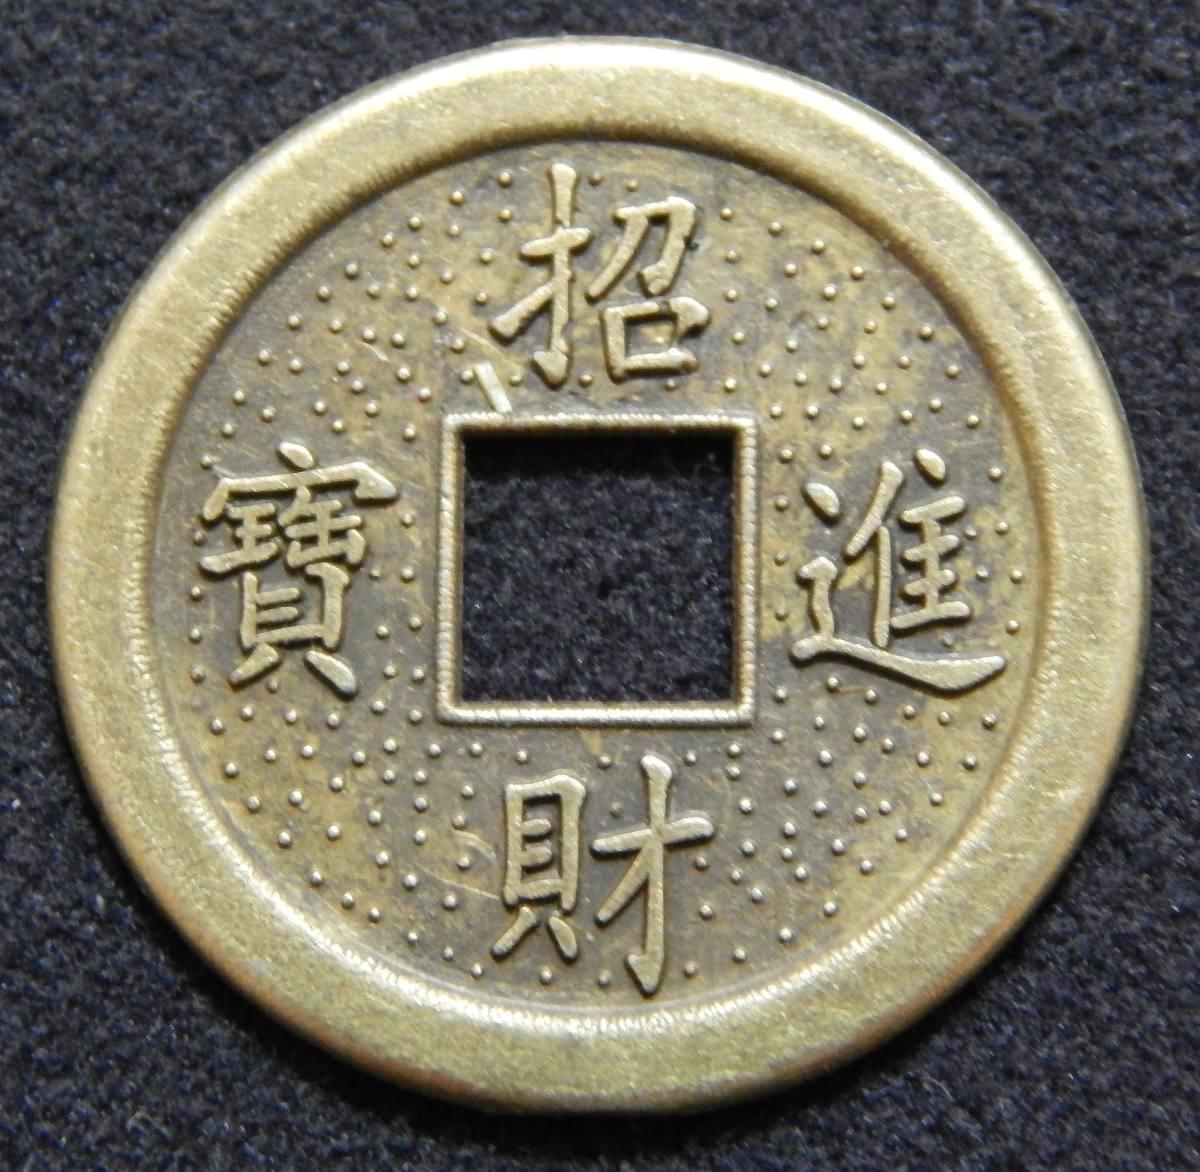 ef83413f964 Moeda Chinesa Feng Shui Talismã Sorte   Fortuna 30mm - R  9